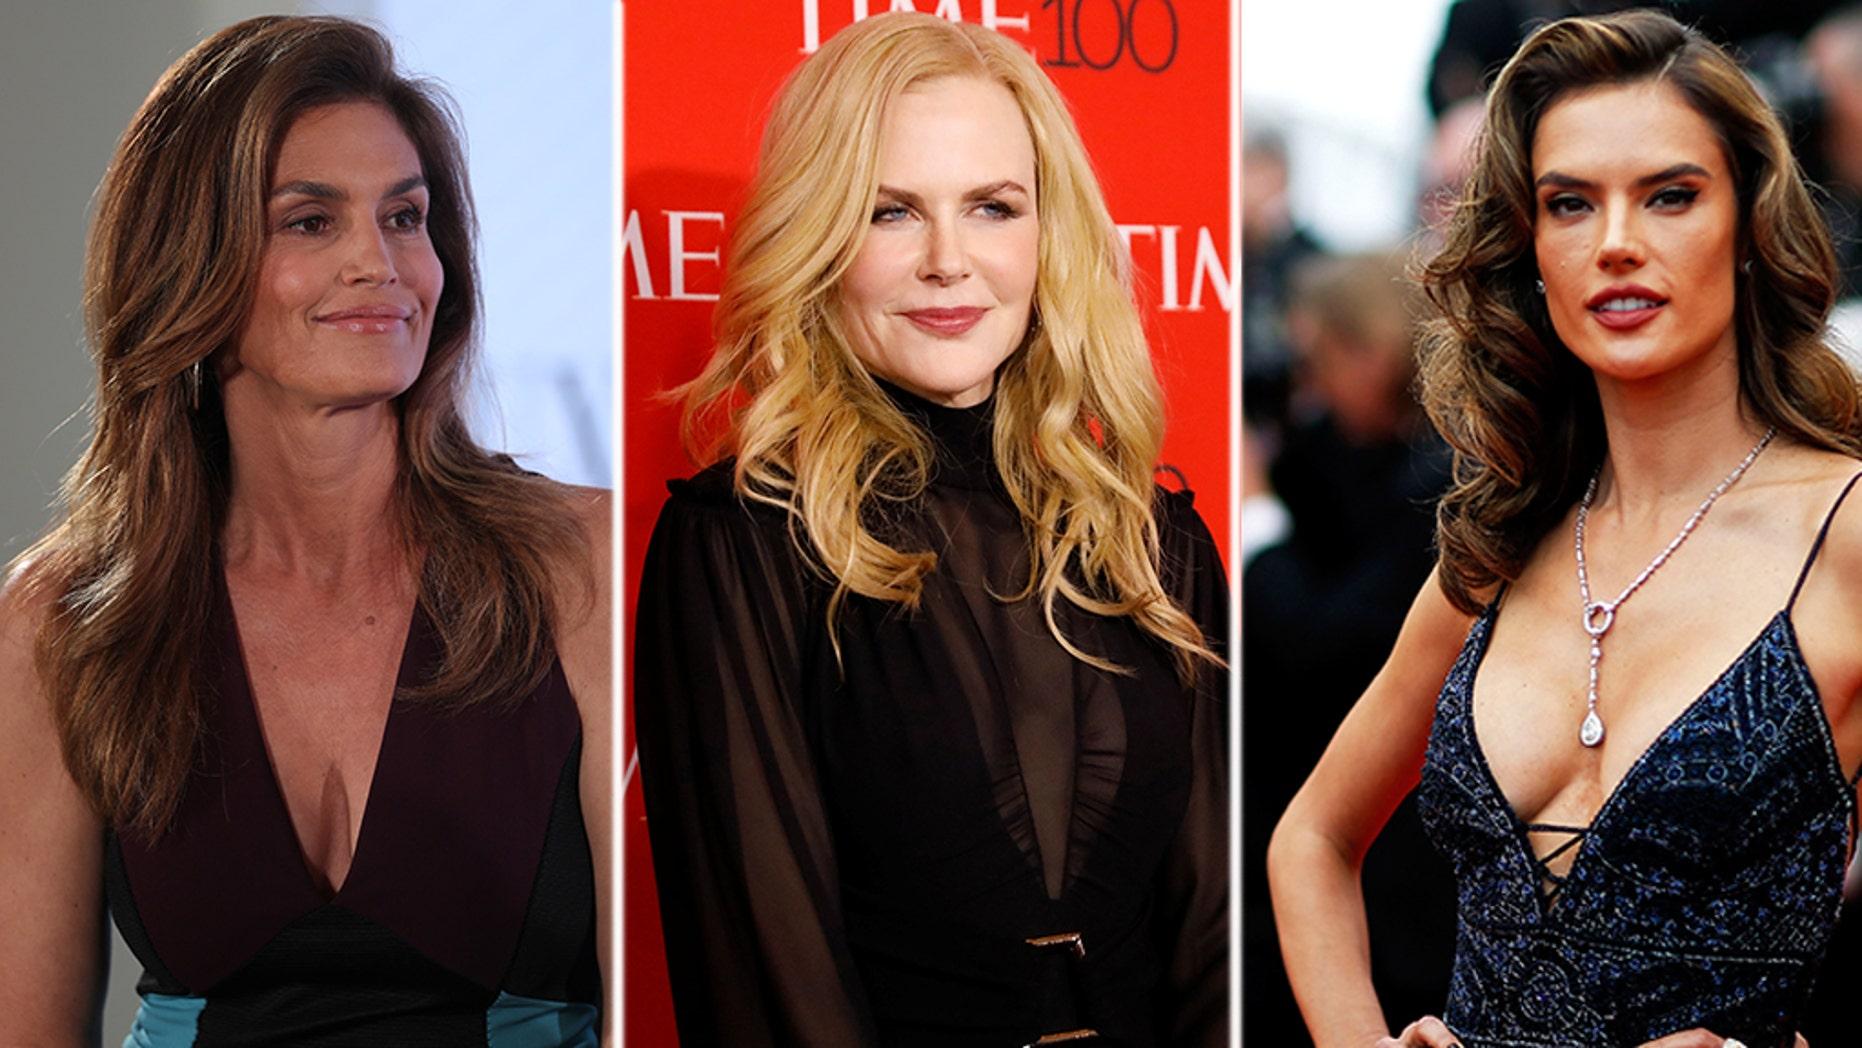 Cindy Crawford, Nicole Kidman, and Alessandra Ambrosio are on a trip to China as Omega brand ambassadors.